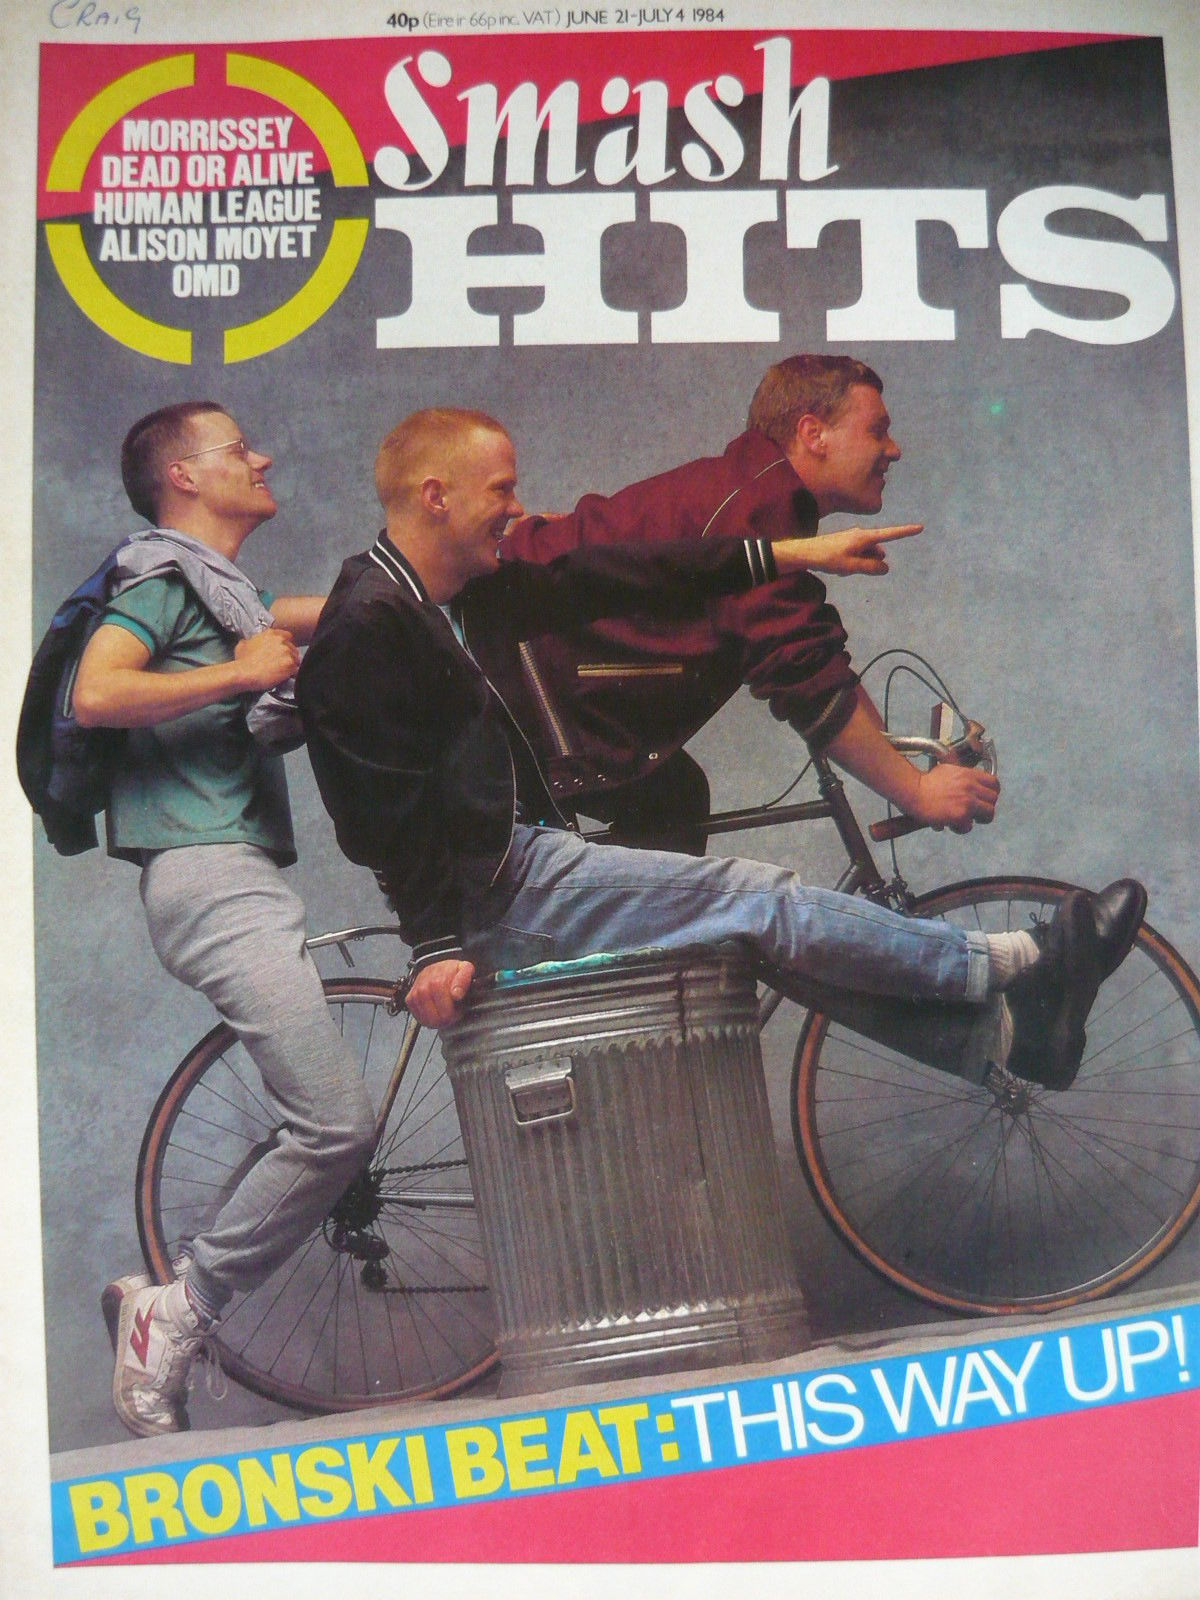 Bronski Beat on the cover of Smash Hits, 1984.